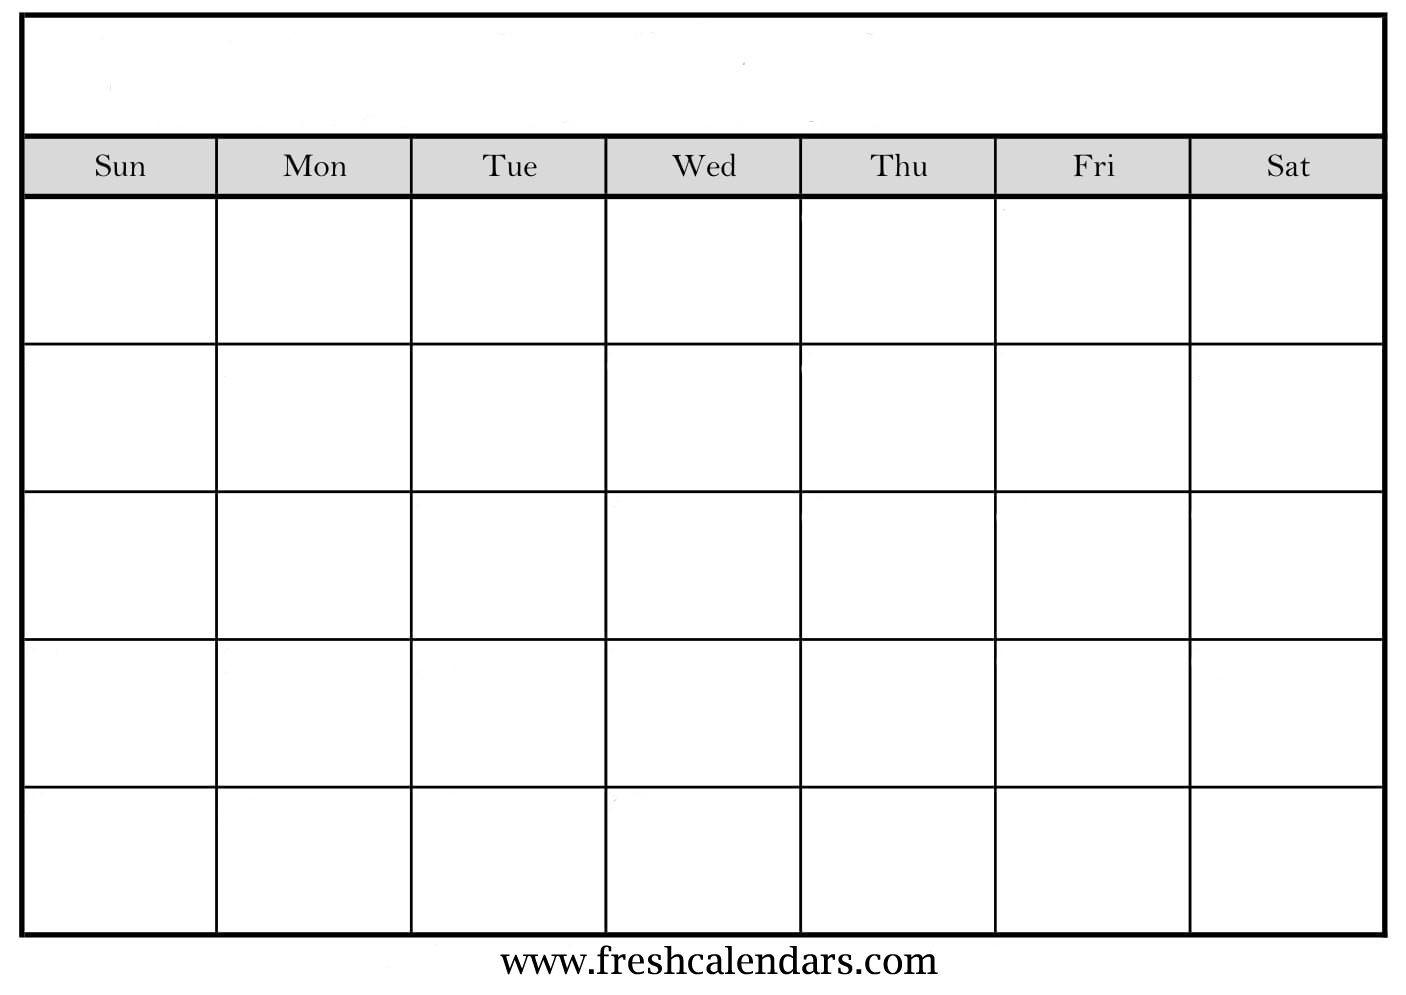 Calendar Template Free Printable Blank Calendar Wonderfully with Printable Blank Calendar Template